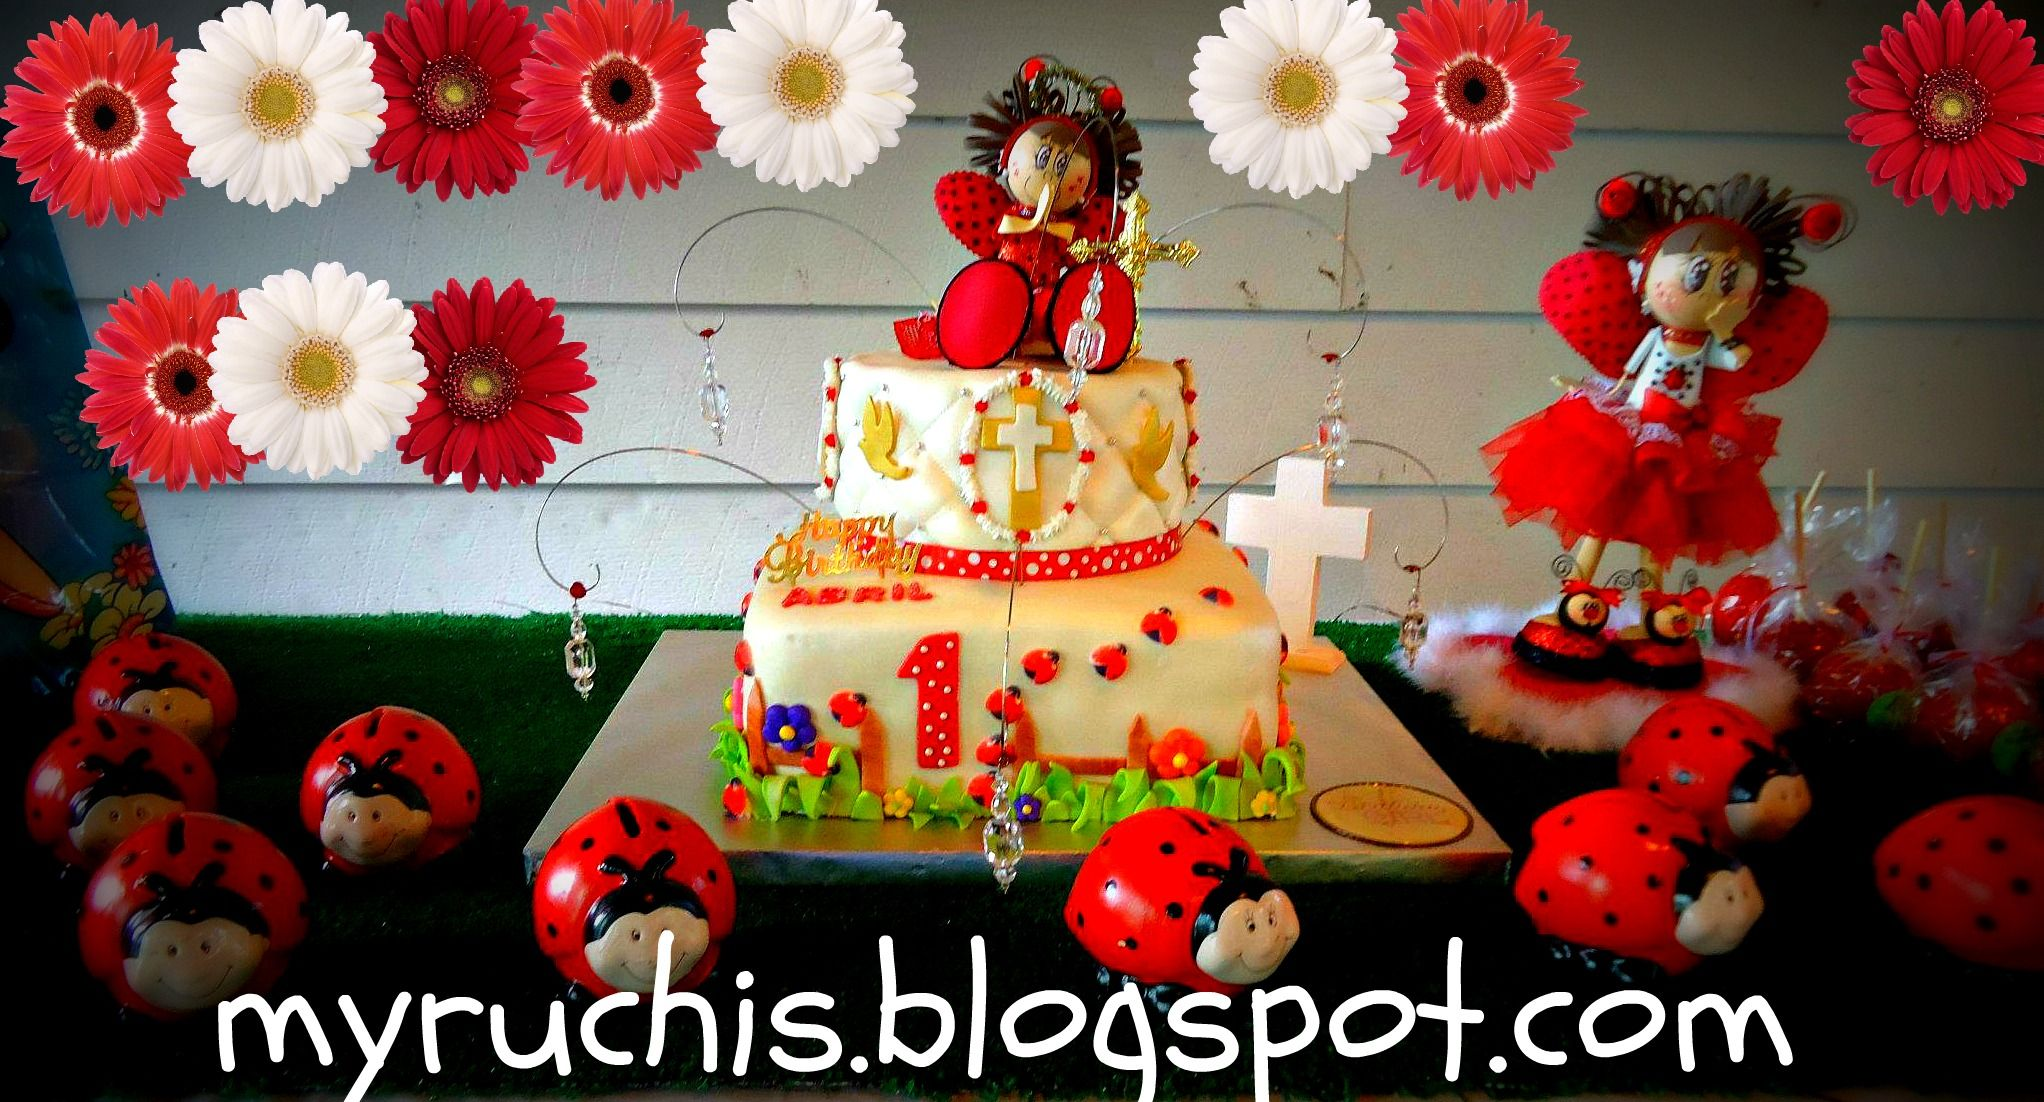 Fiesta ladybug decoraci n fiesta infantil fiesta ni a fiesta ladybug pinterest ladybug - Decoracion infantil nina ...